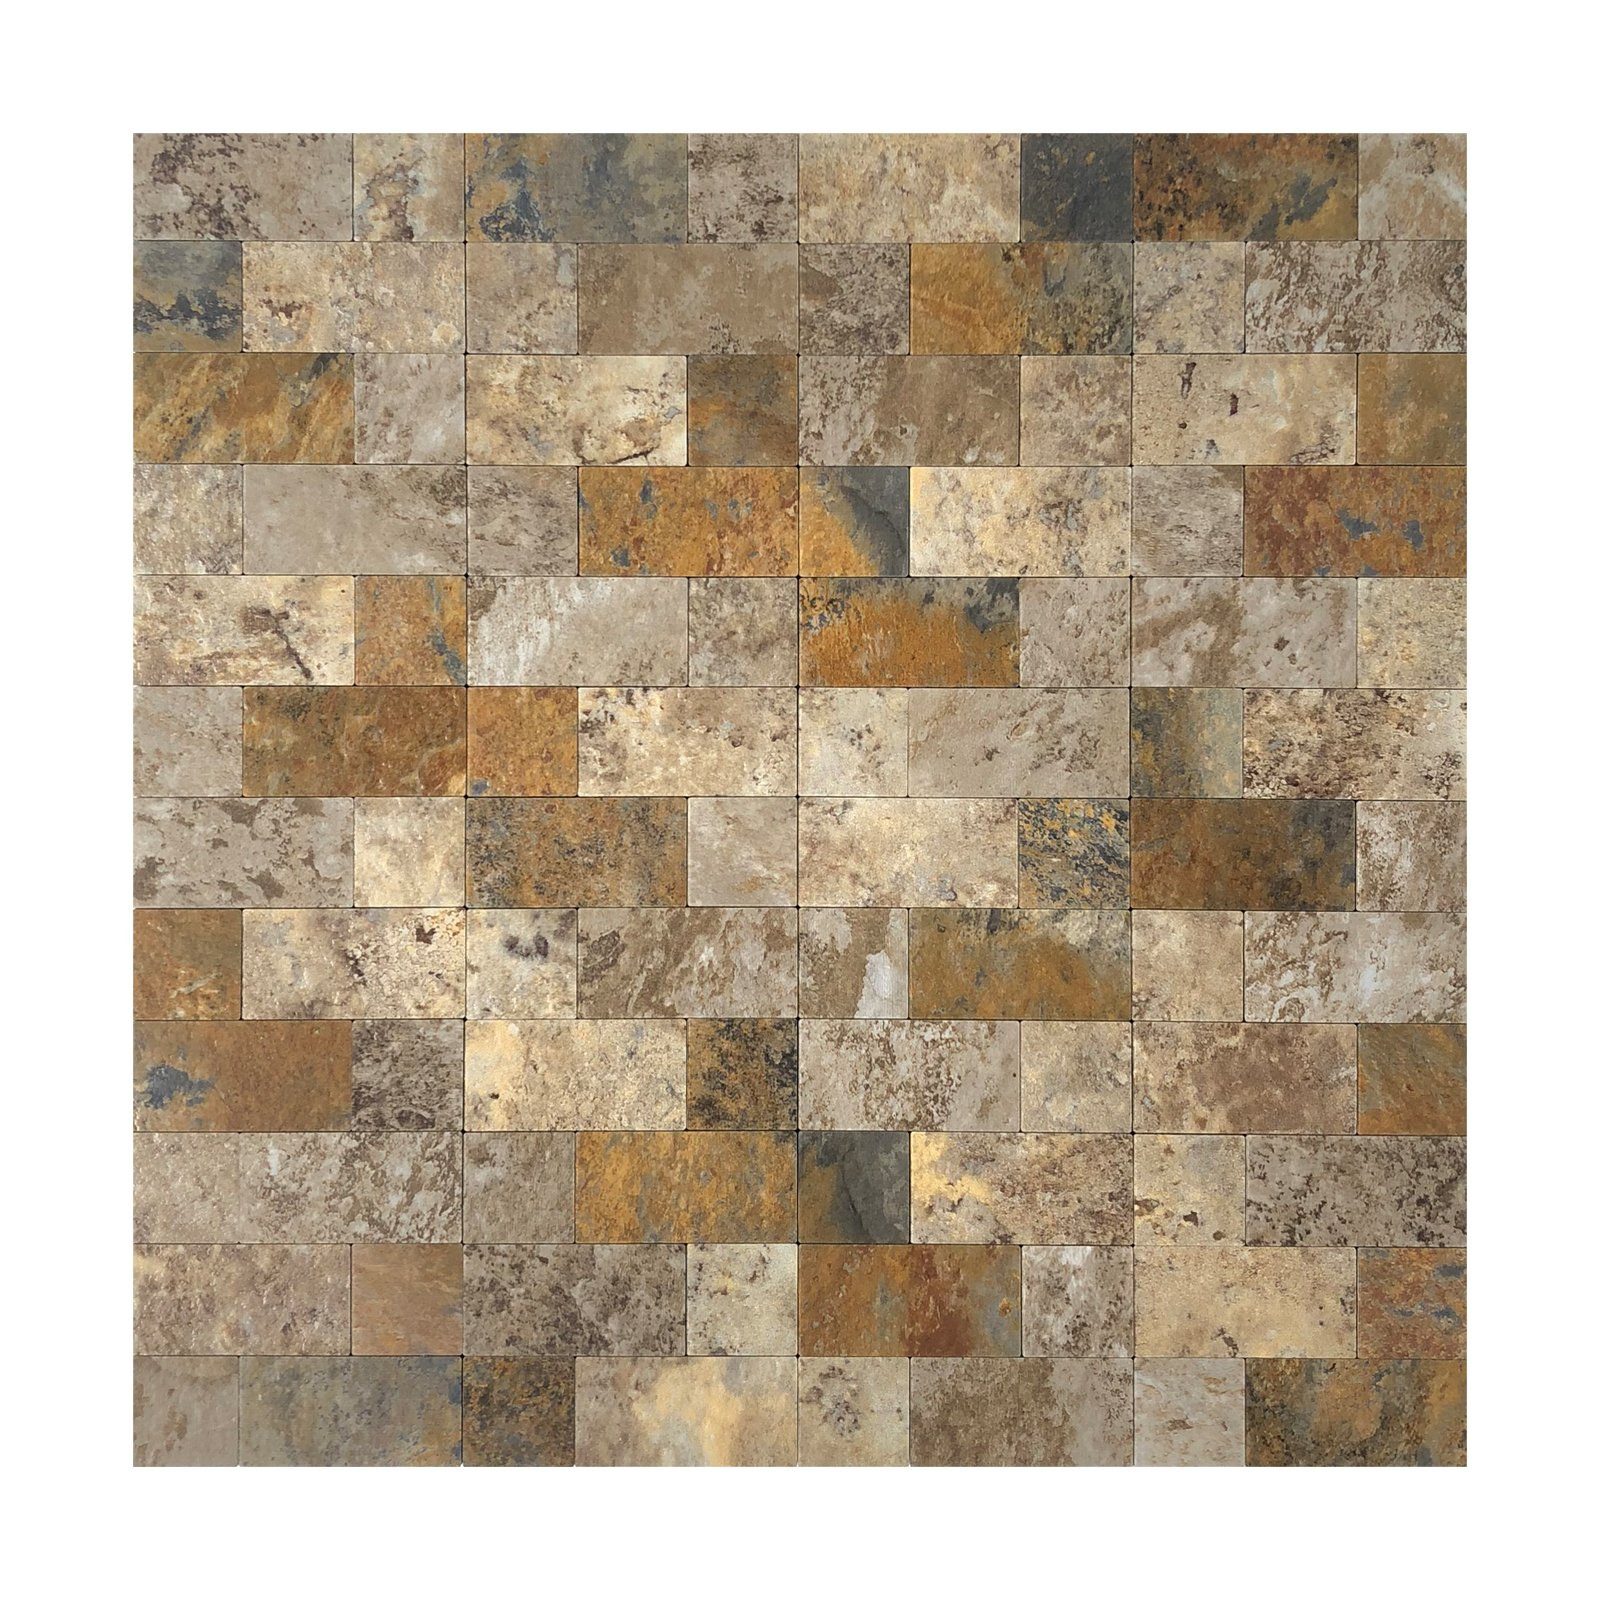 Art3d 12''x12'' Peel and Stick Backsplash Tile for Kitchen, Faux Stone Backsplash (5 Tiles)